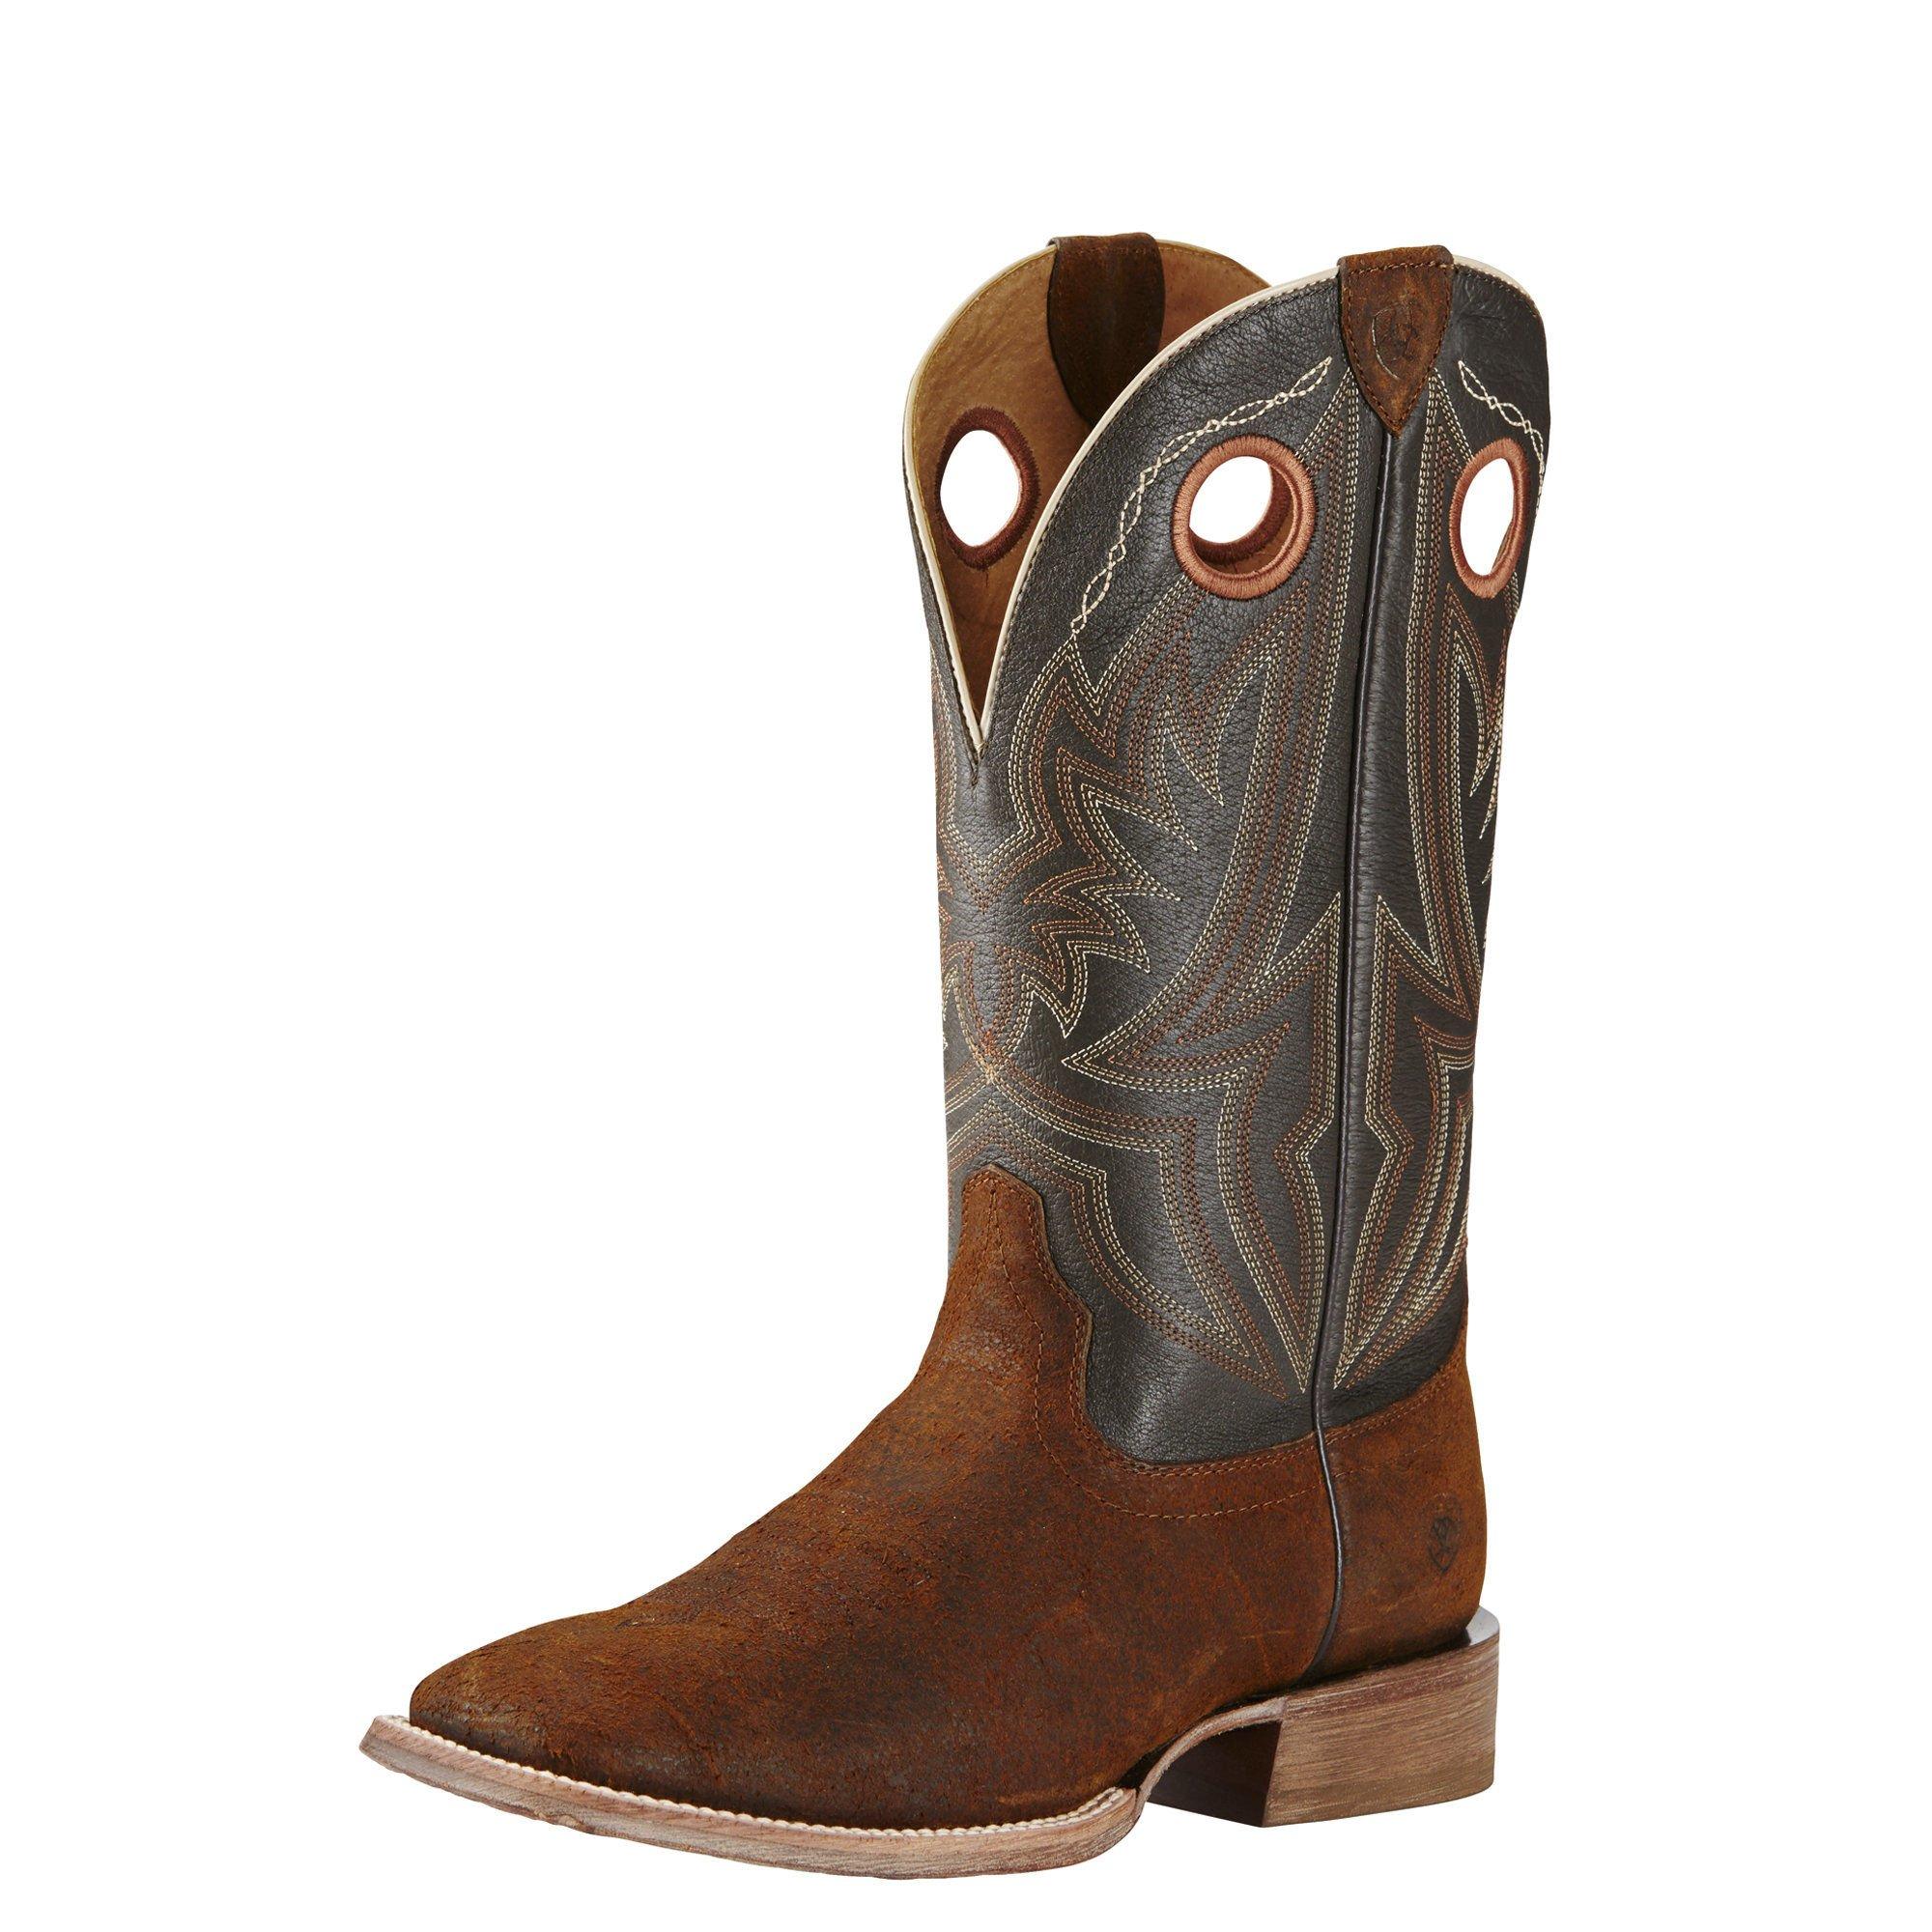 Ariat Men's Circuit Hazer Western Cowboy Boot, Rough Chocolate, 10 D US